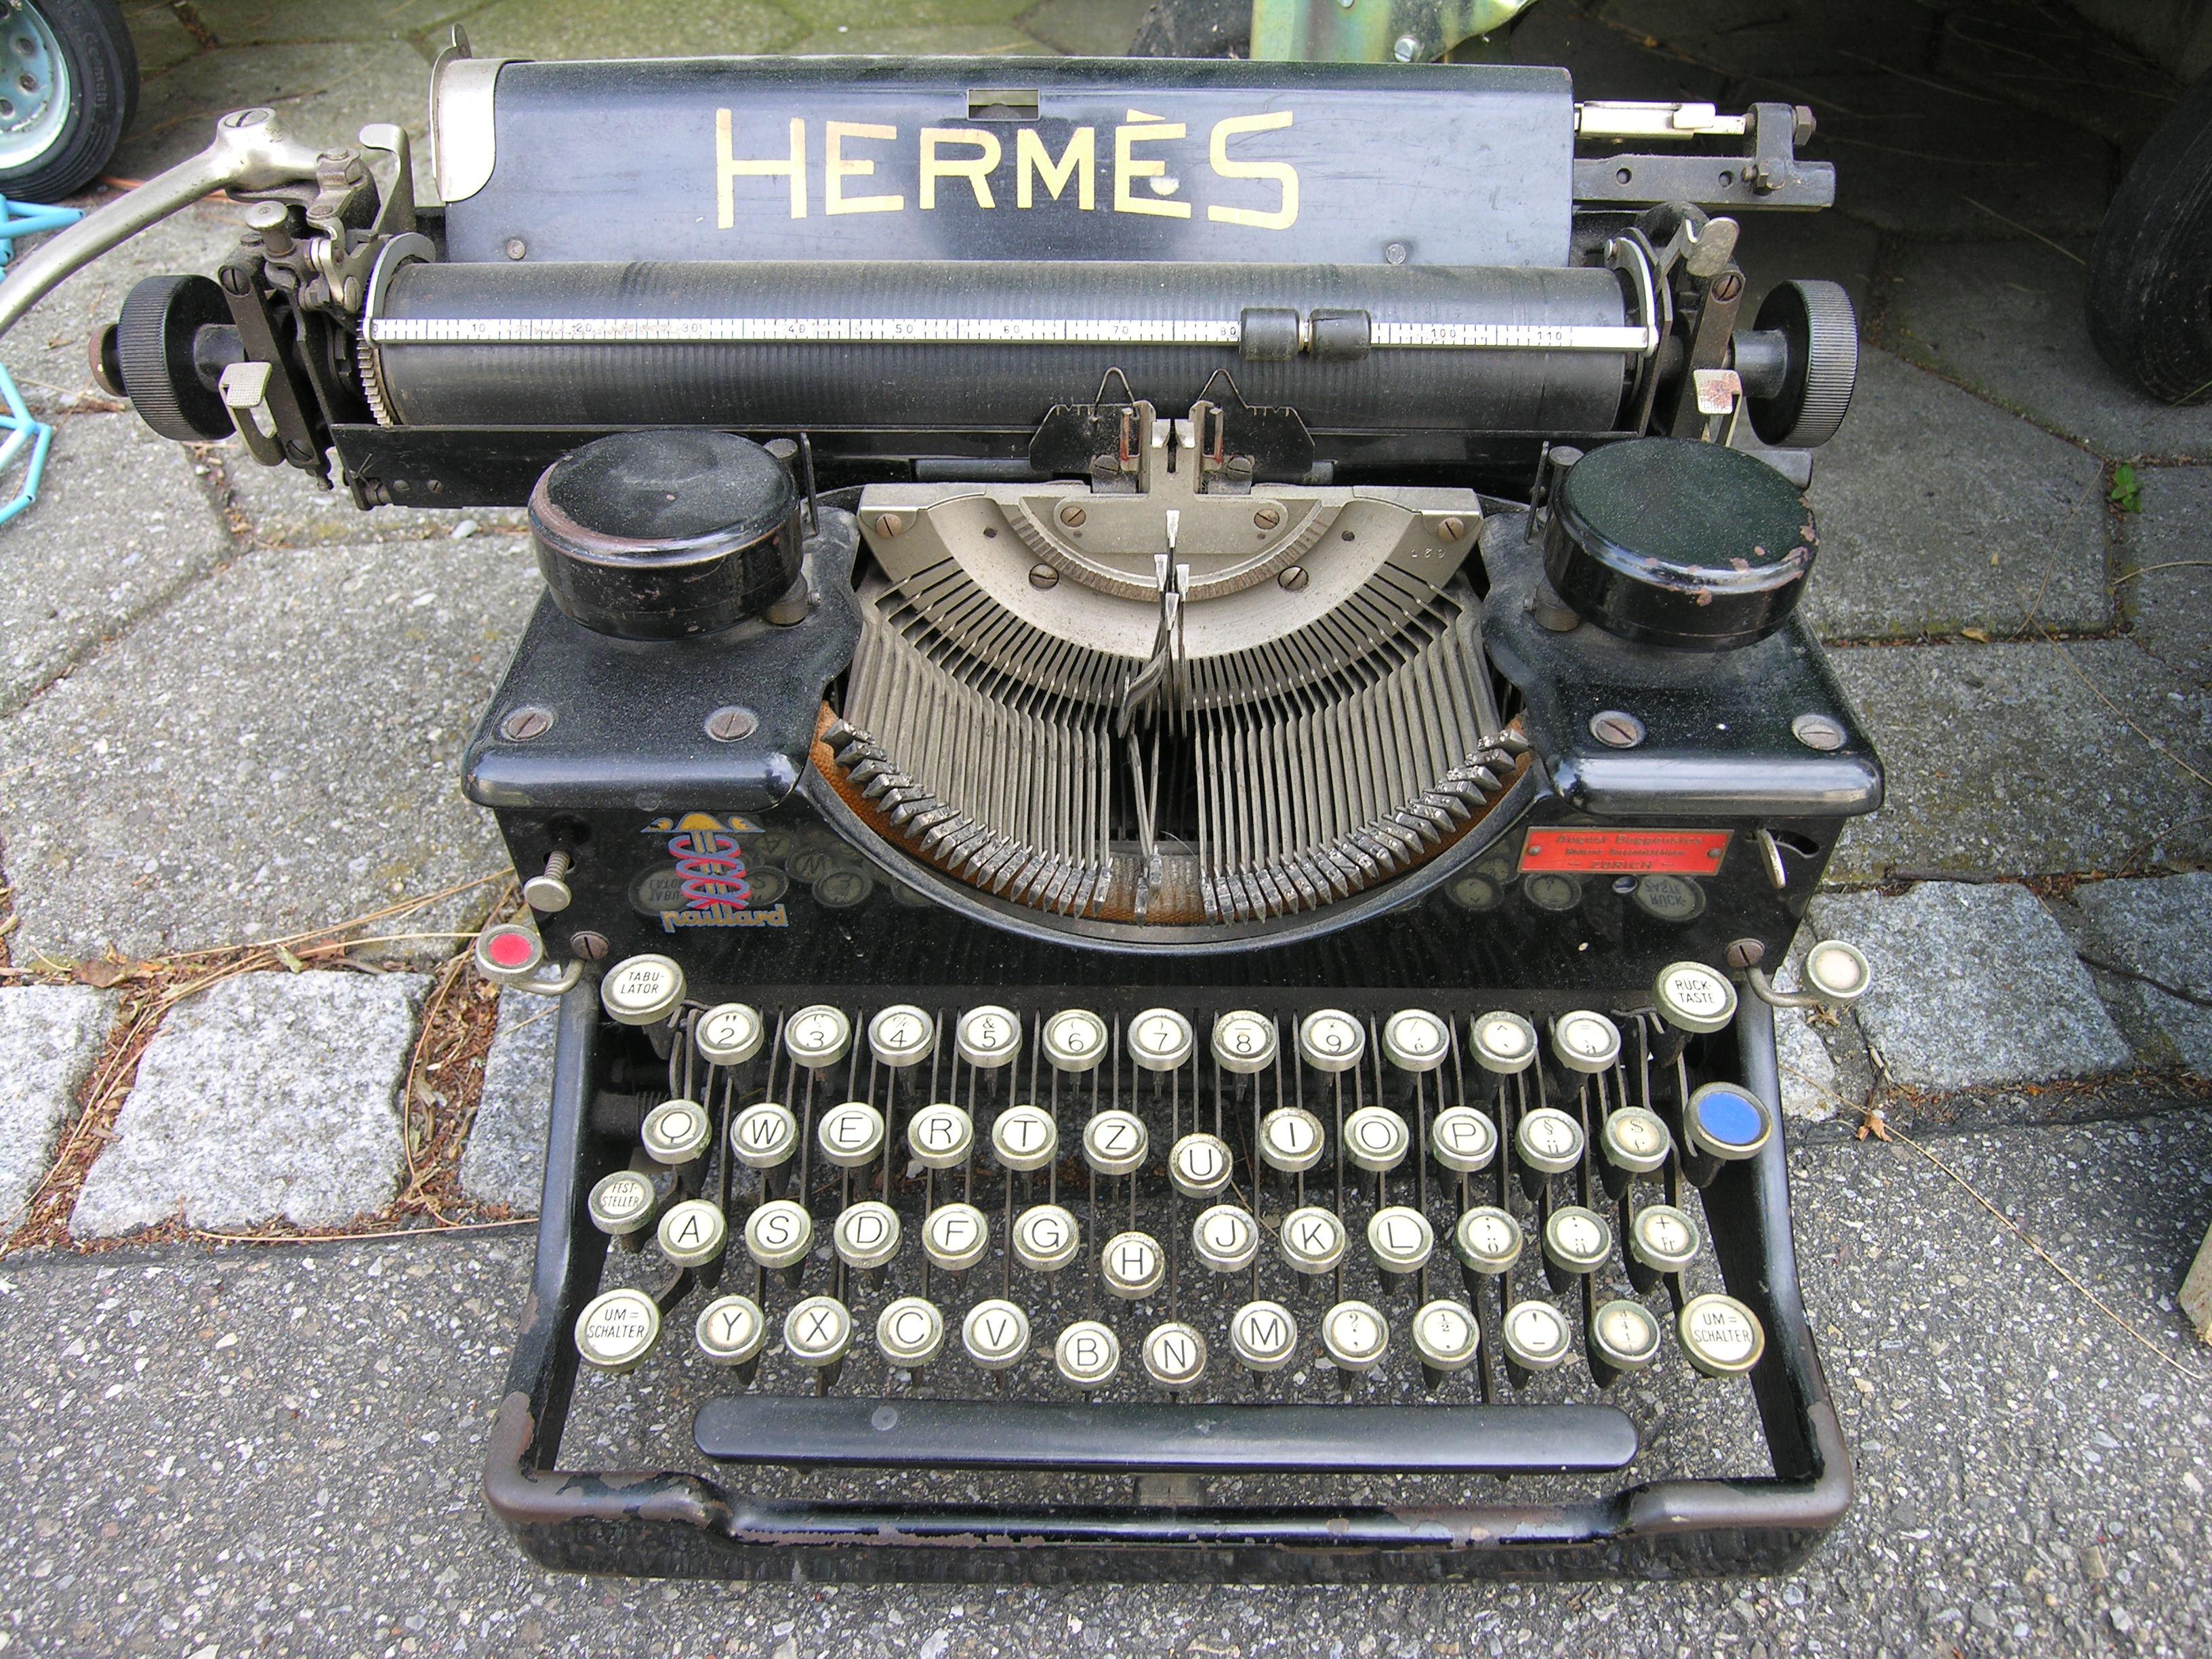 http://upload.wikimedia.org/wikipedia/commons/7/75/TypewriterHermes.jpg